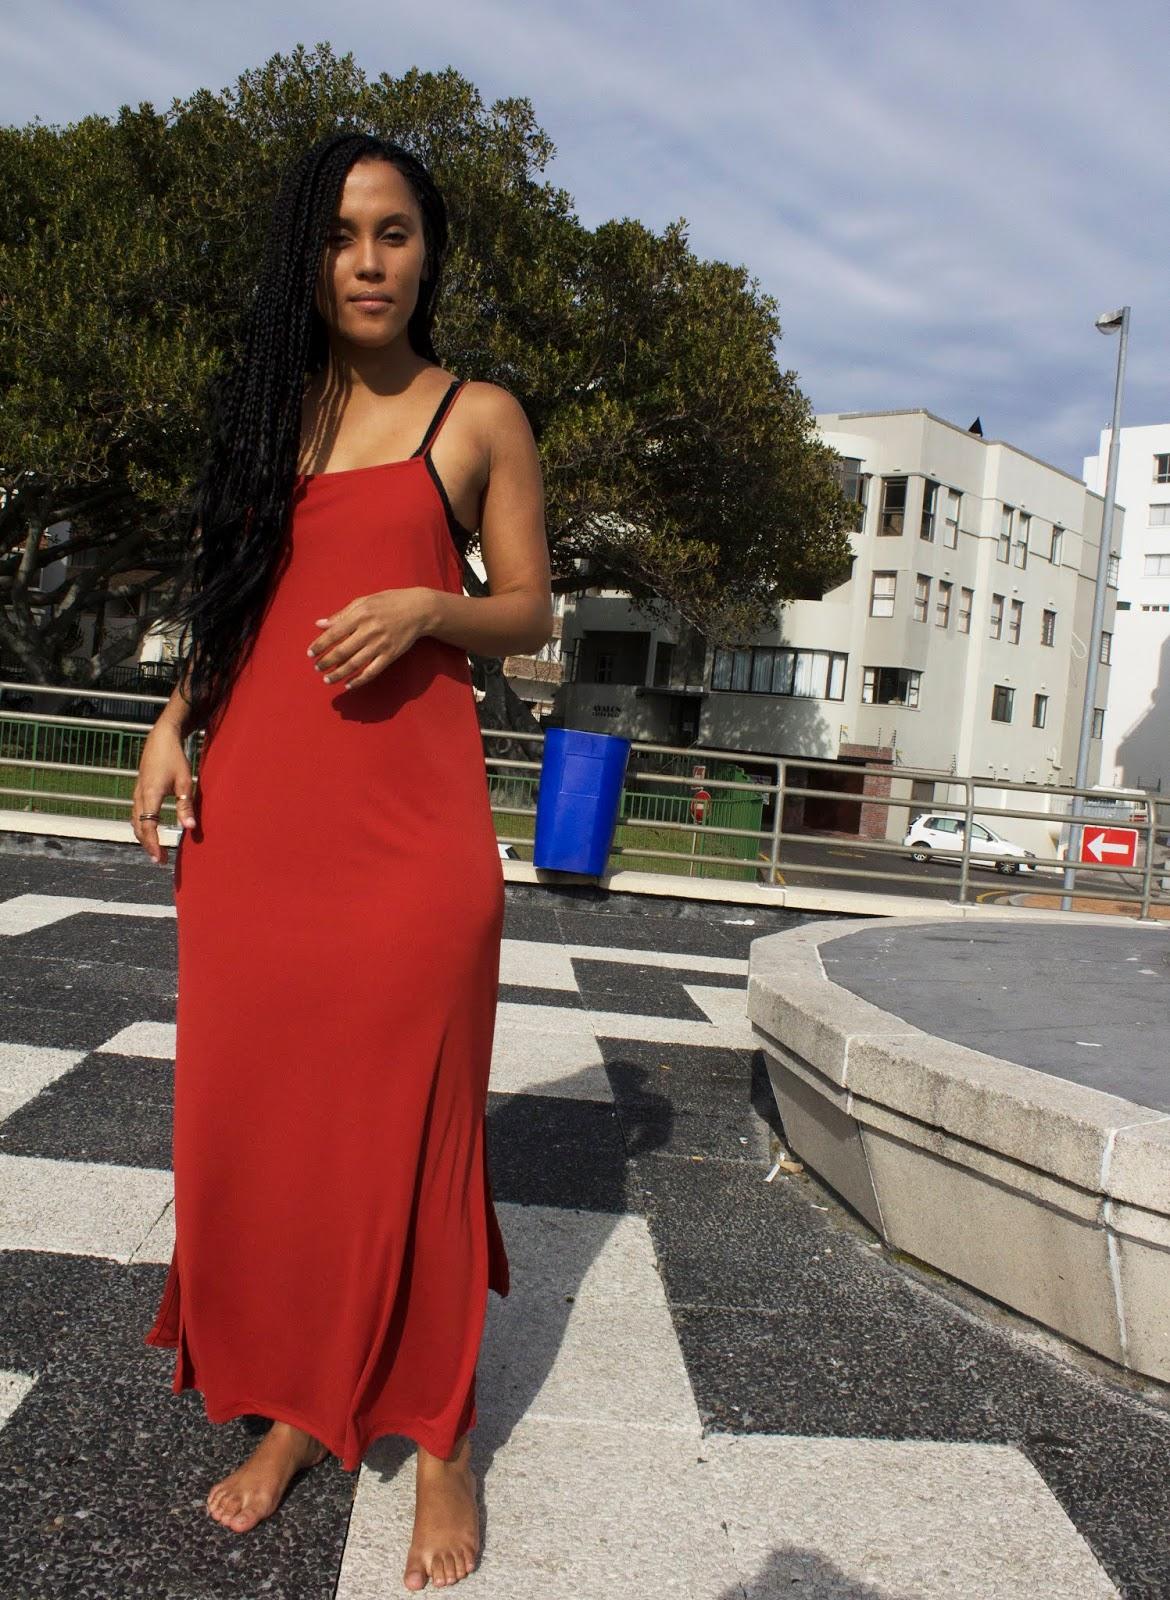 Liezel-Esquire-slip-dress